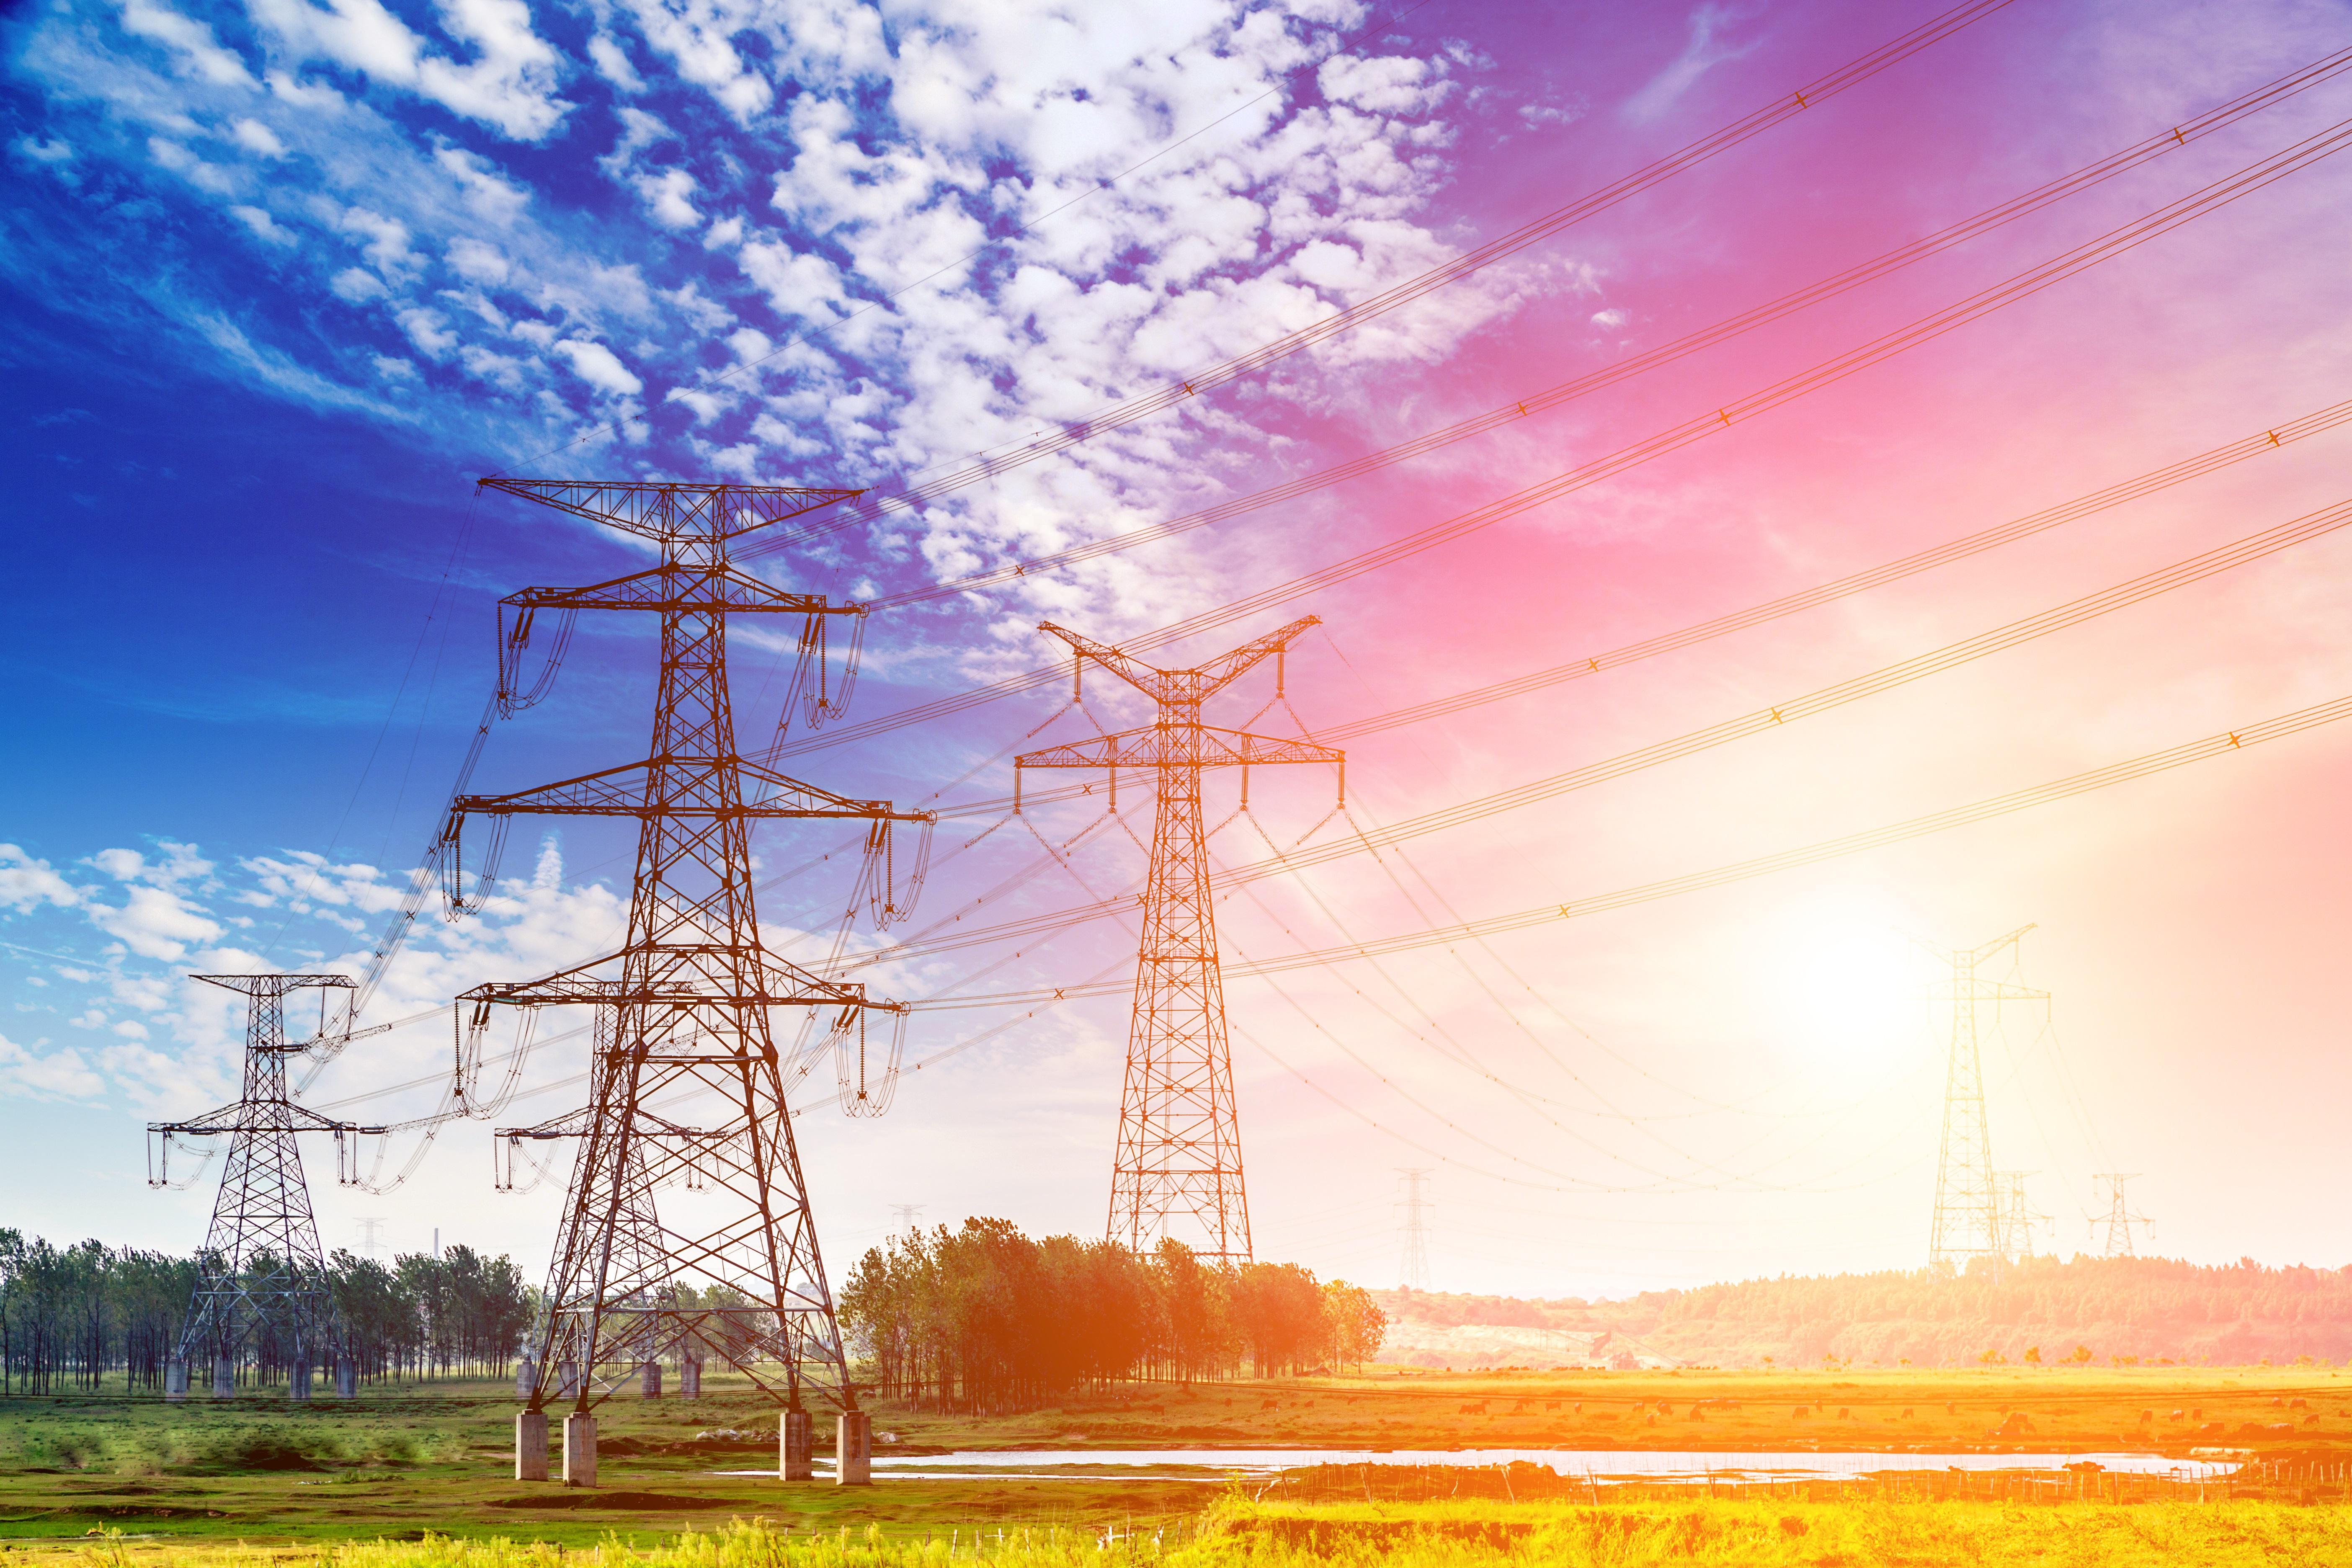 shutterstock_transmission lines